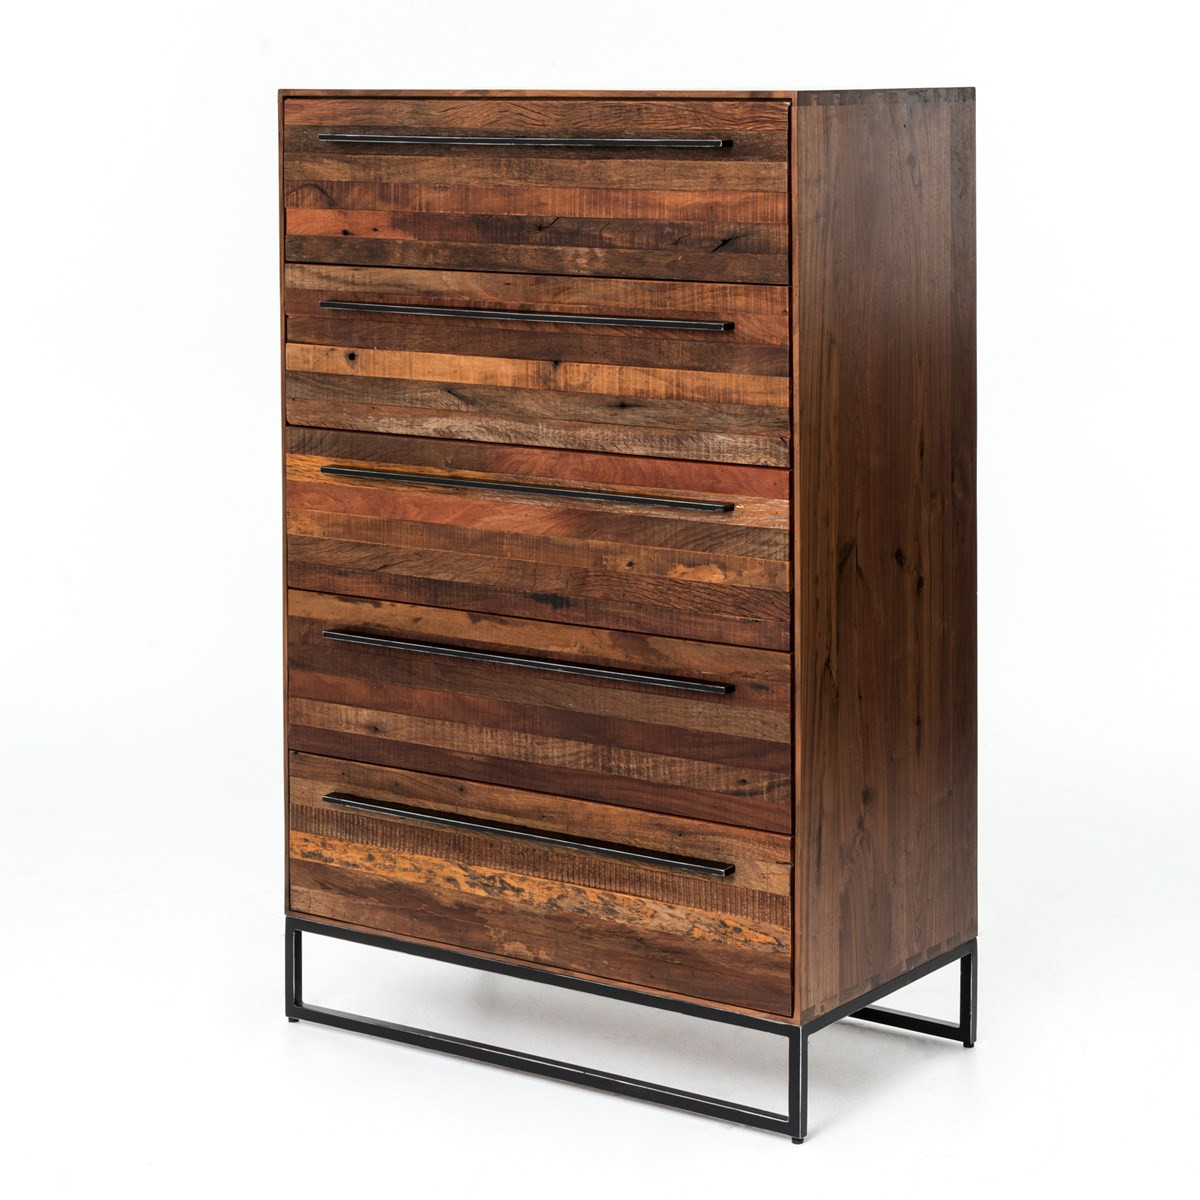 Emily Reclaimed Wood Tall Dresser · Emily Reclaimed wood 5 Drawer chest ... - Emily Reclaimed Wood Tall 5 Drawer Dresser Zin Home